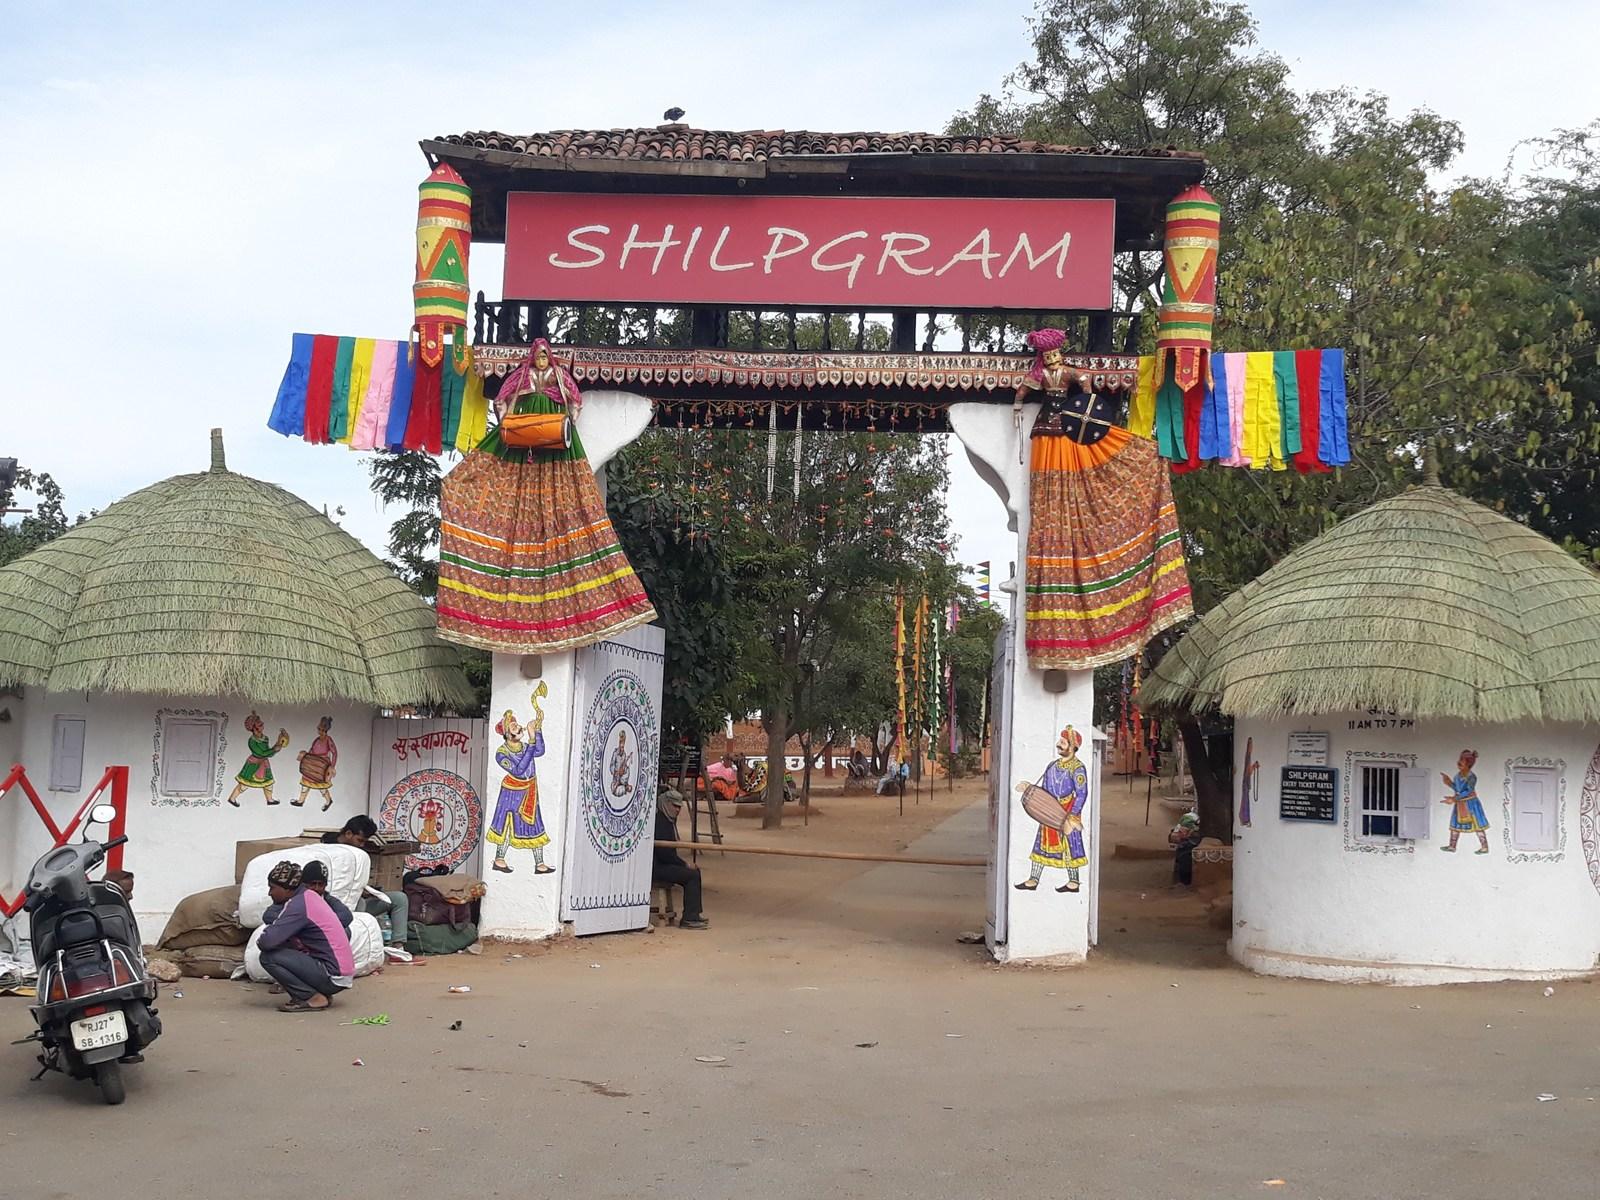 Shilpgram